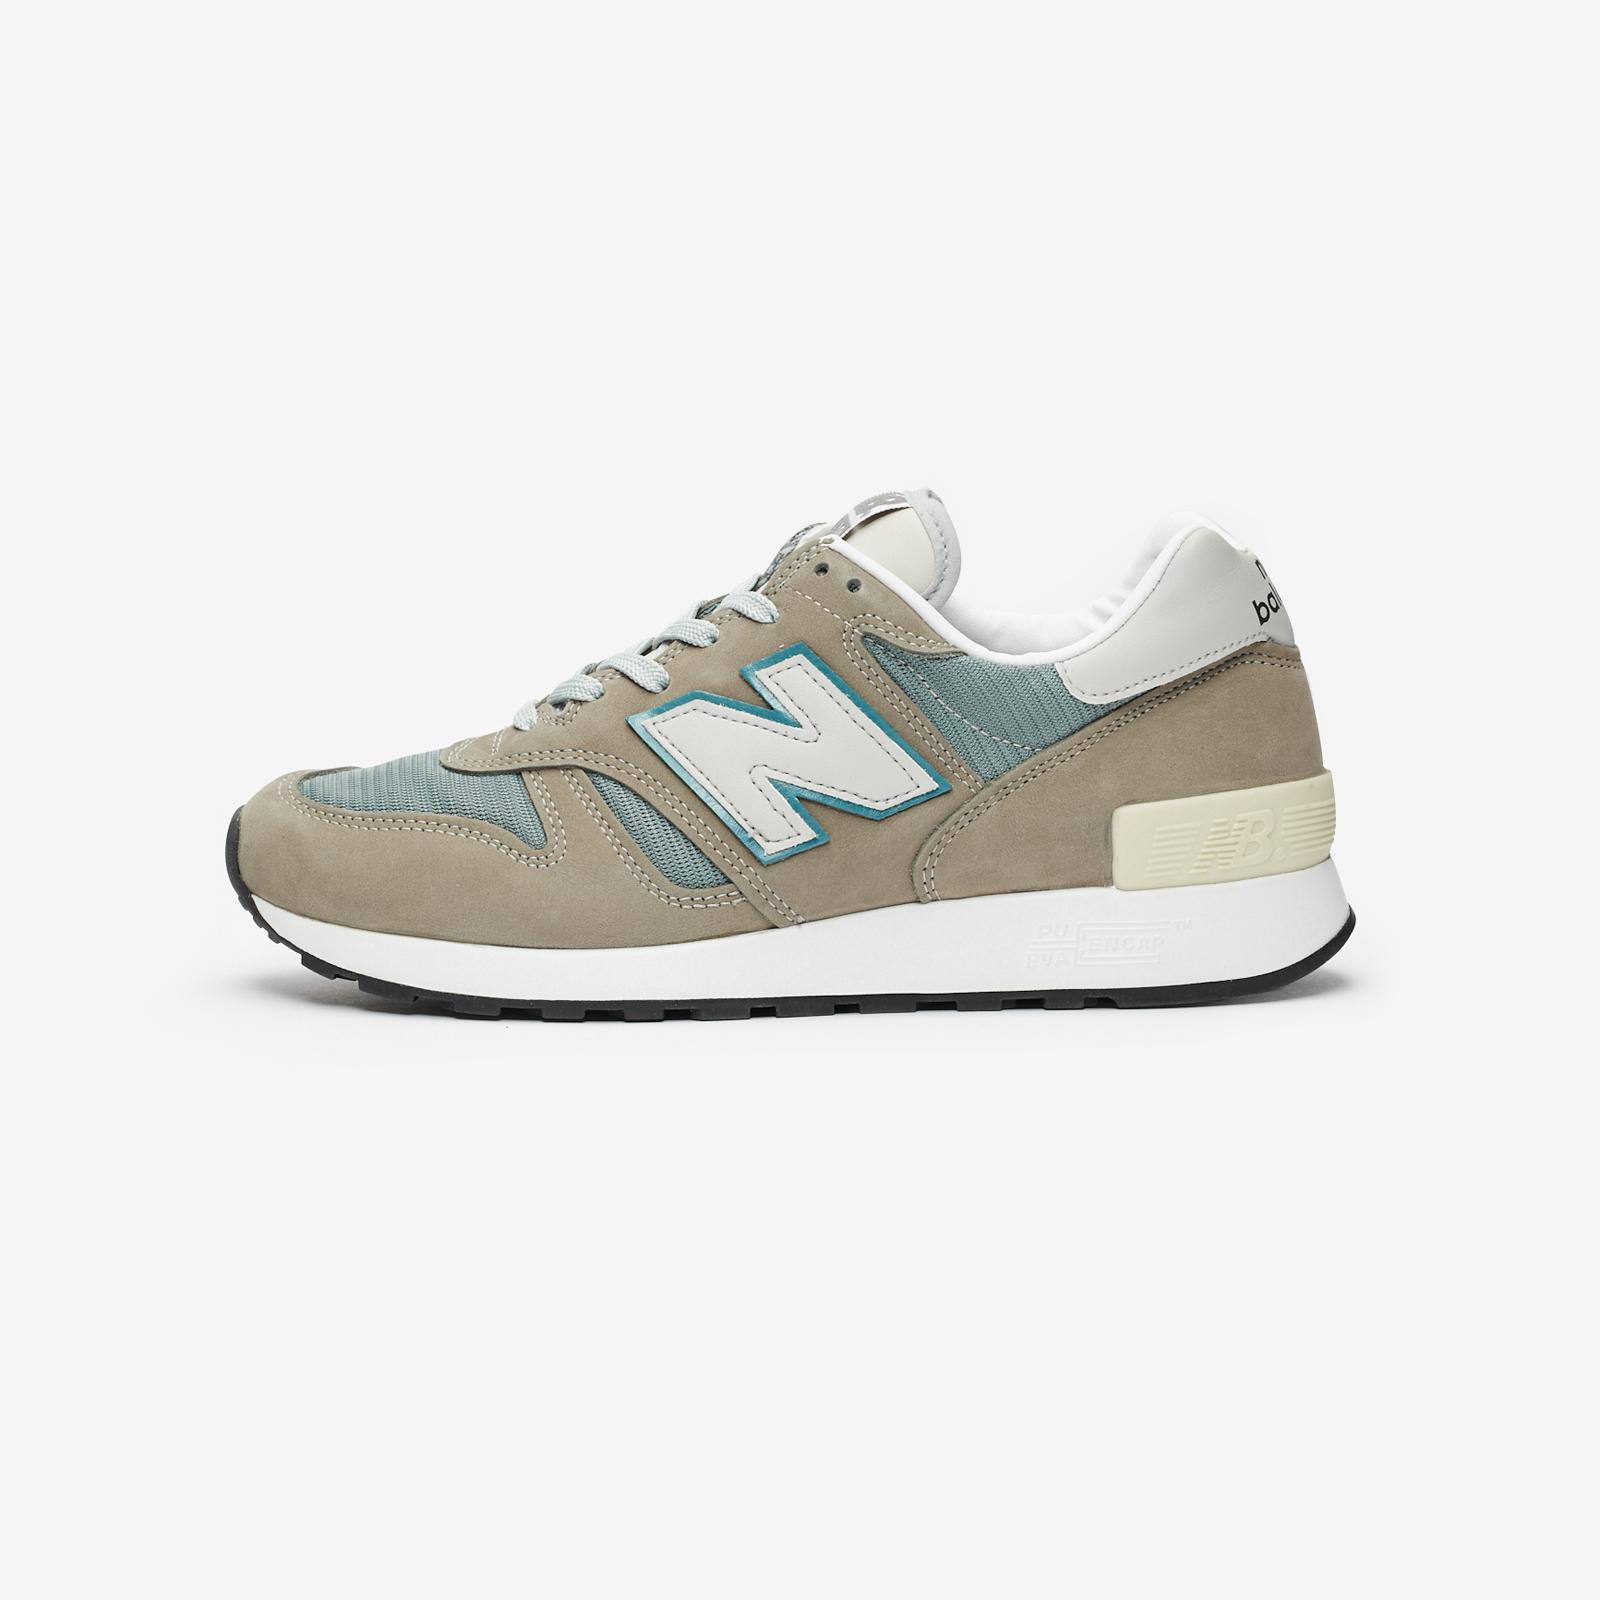 New Balance M1300 - M1300jp3 - SNS   sneakers & streetwear online ...